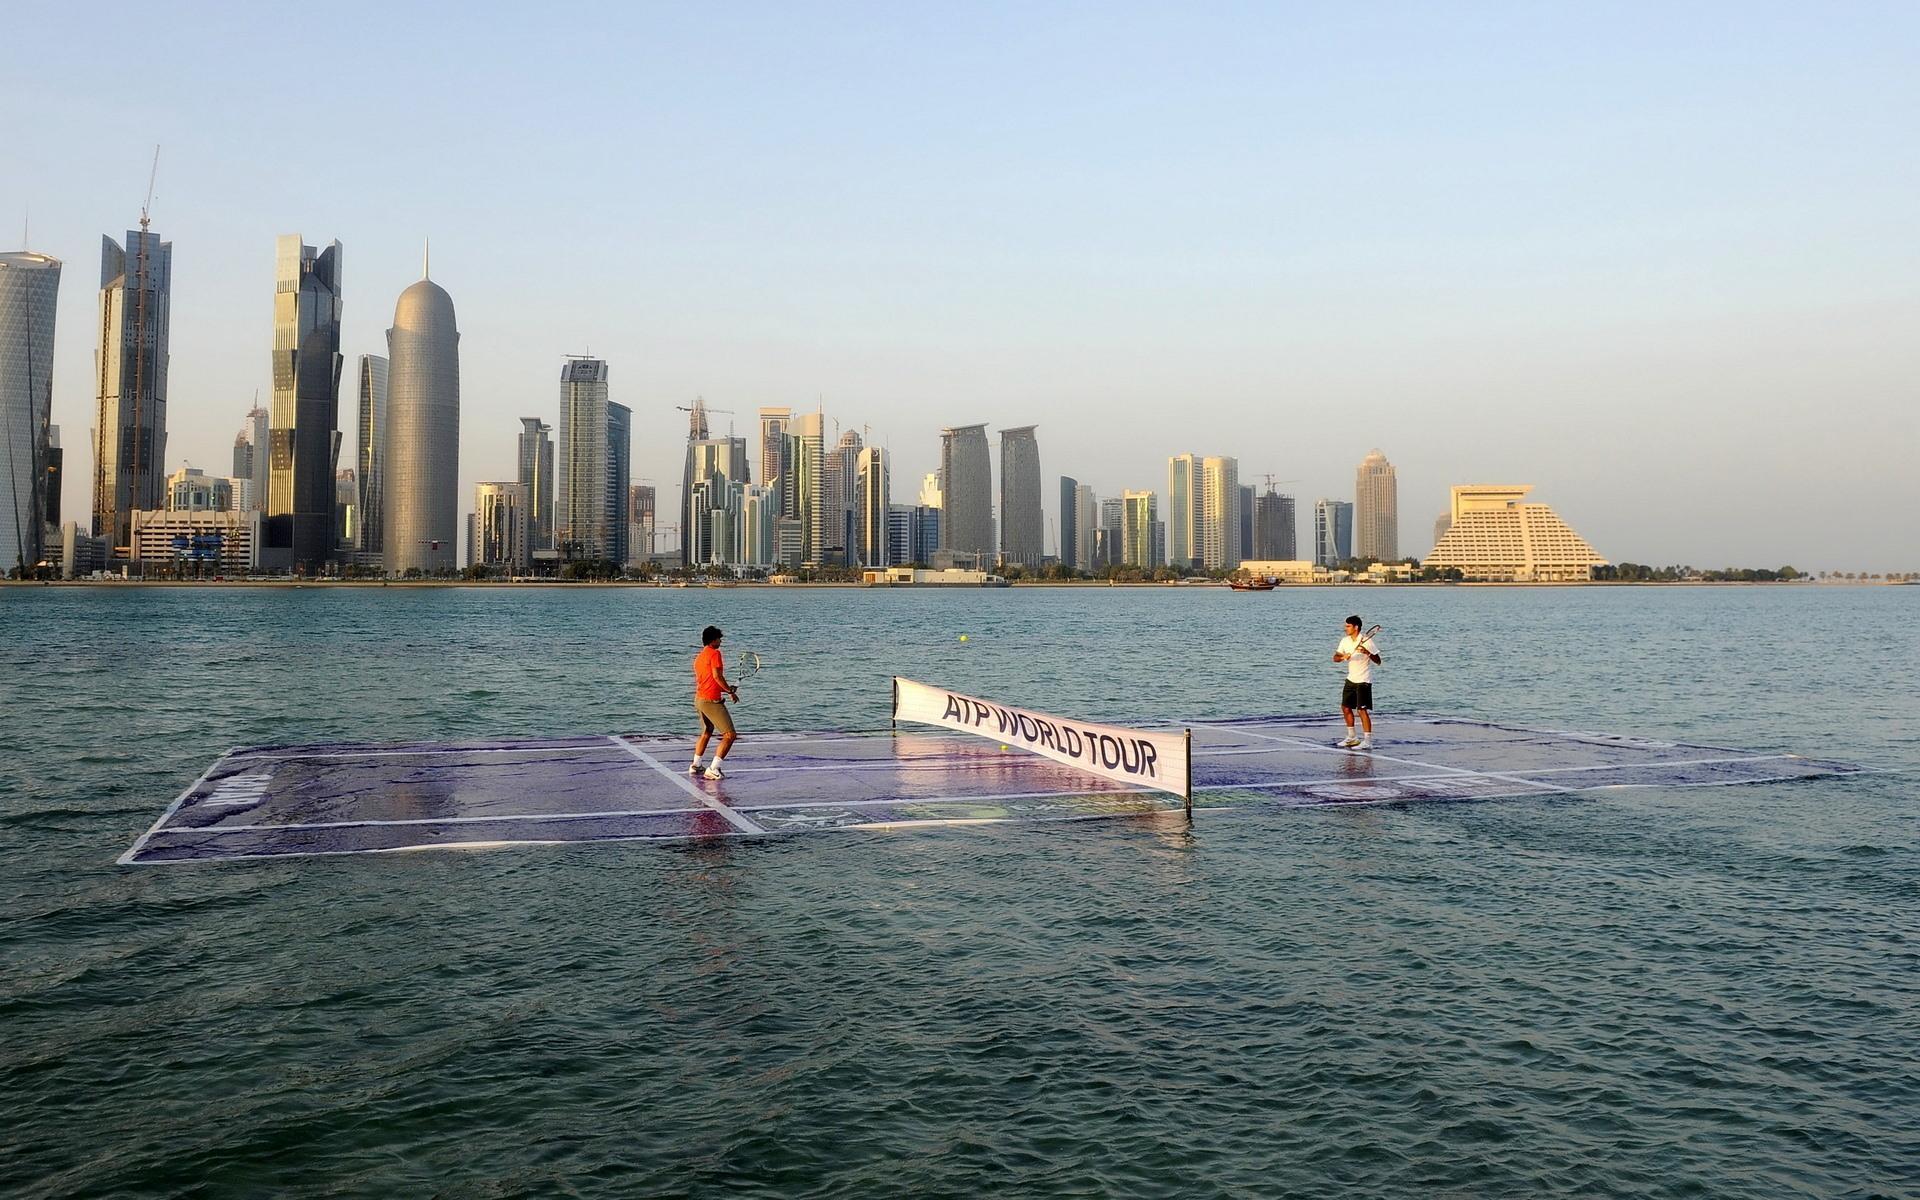 water-tennis-federer-nadal-doha-atp-2011_53f95d